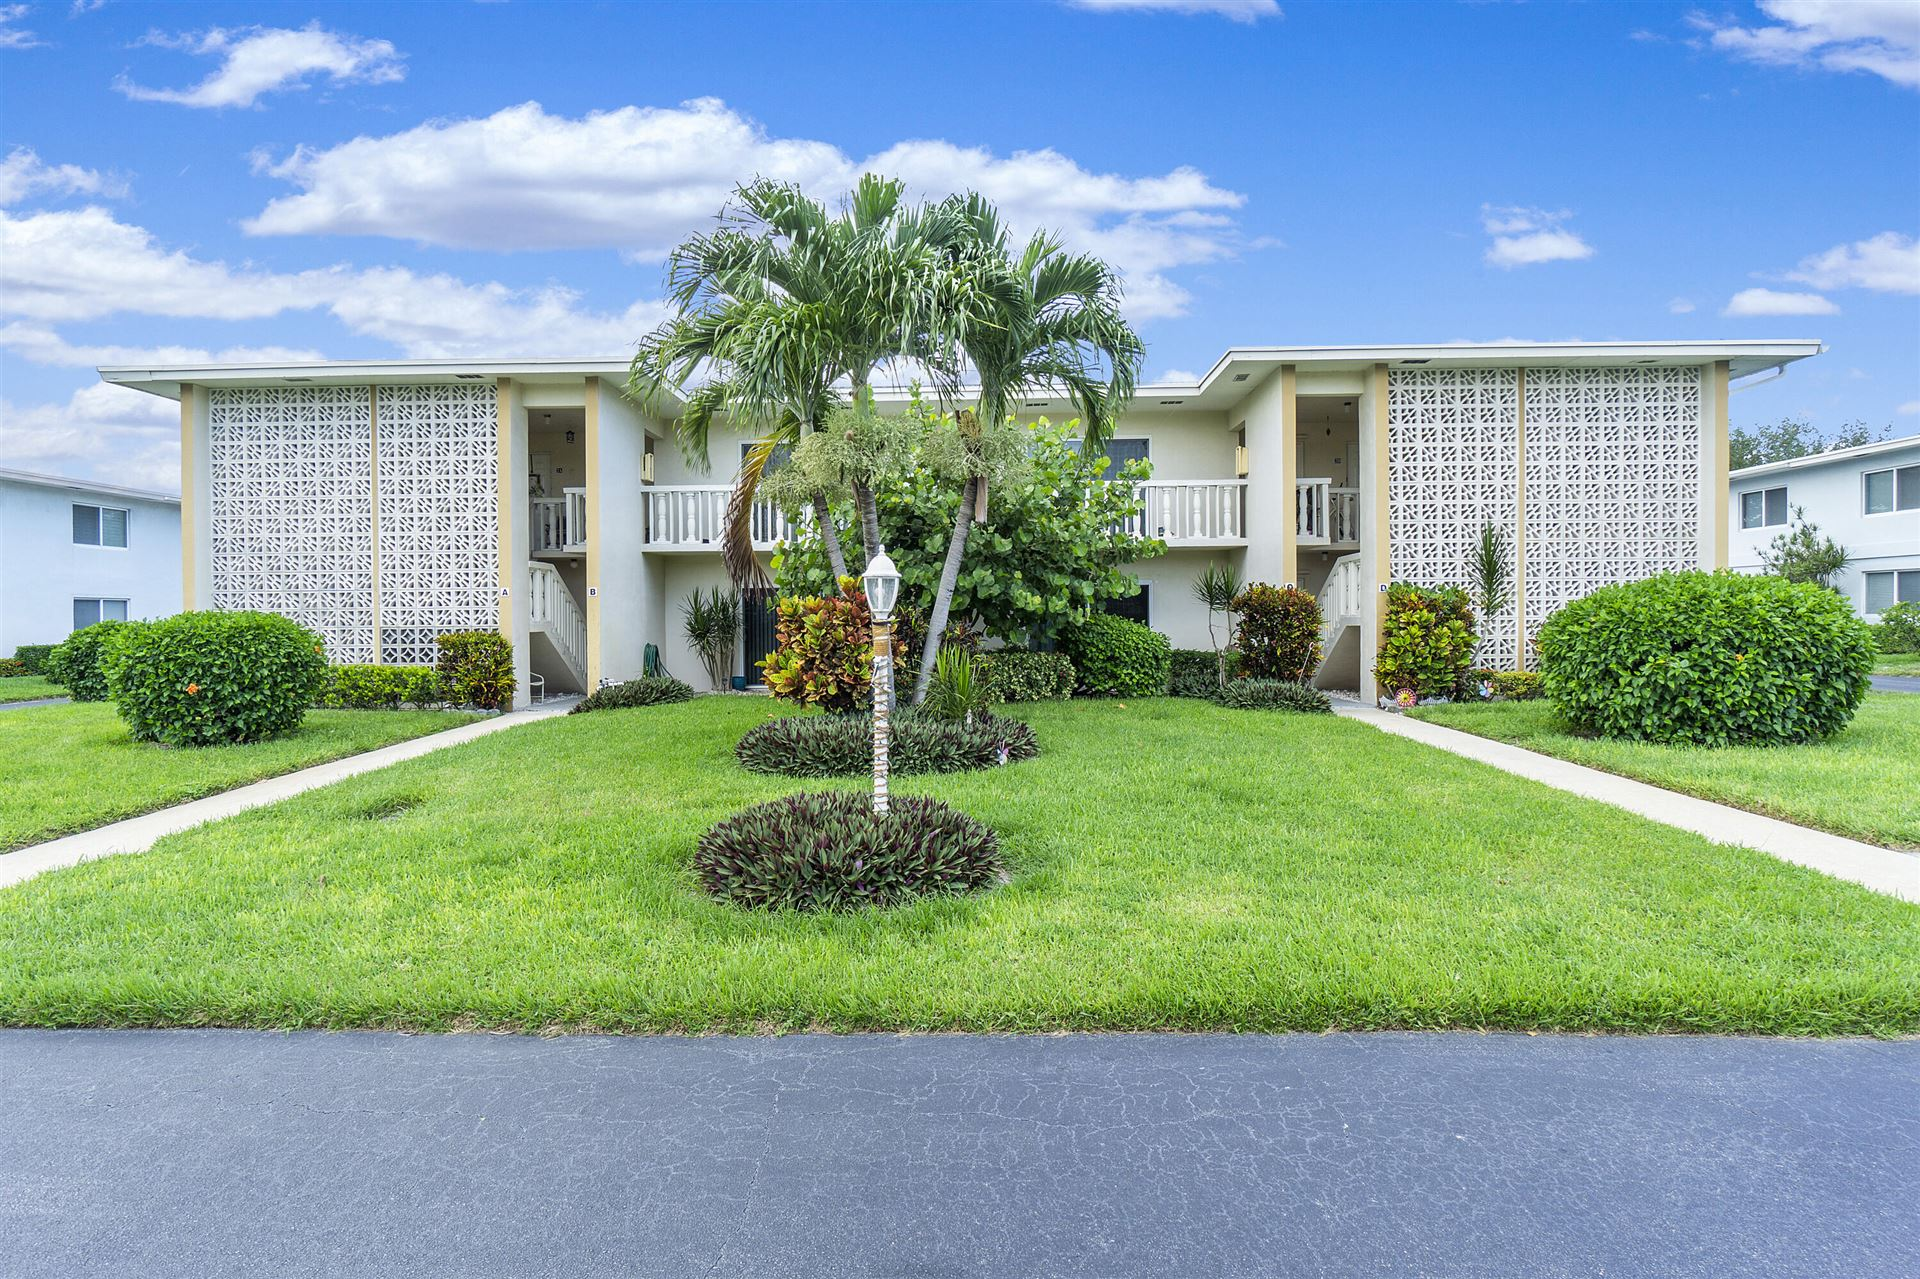 215 Main 2d Boulevard #2d, Boynton Beach, FL 33435 - #: RX-10735183